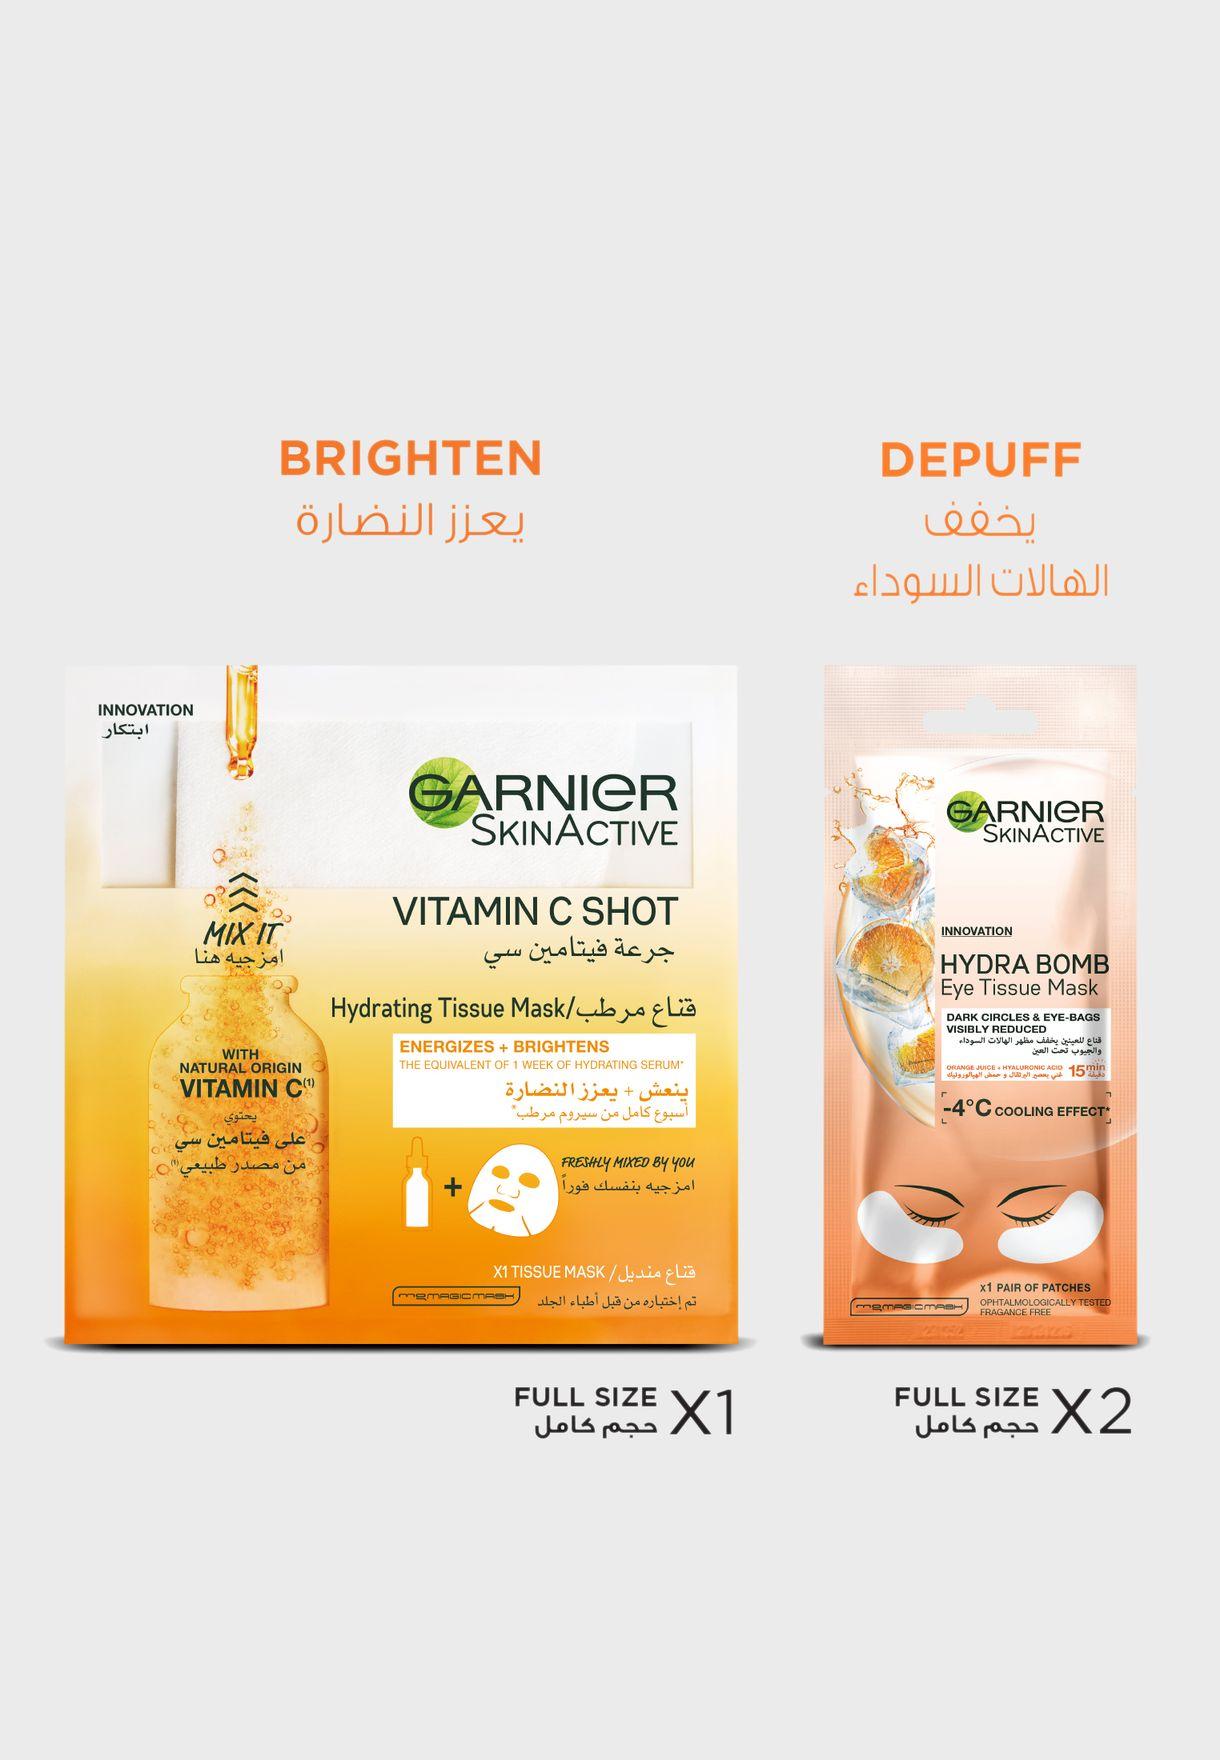 10 Masks - Ultimate Hydration Face Mask Kit Saving, 27%